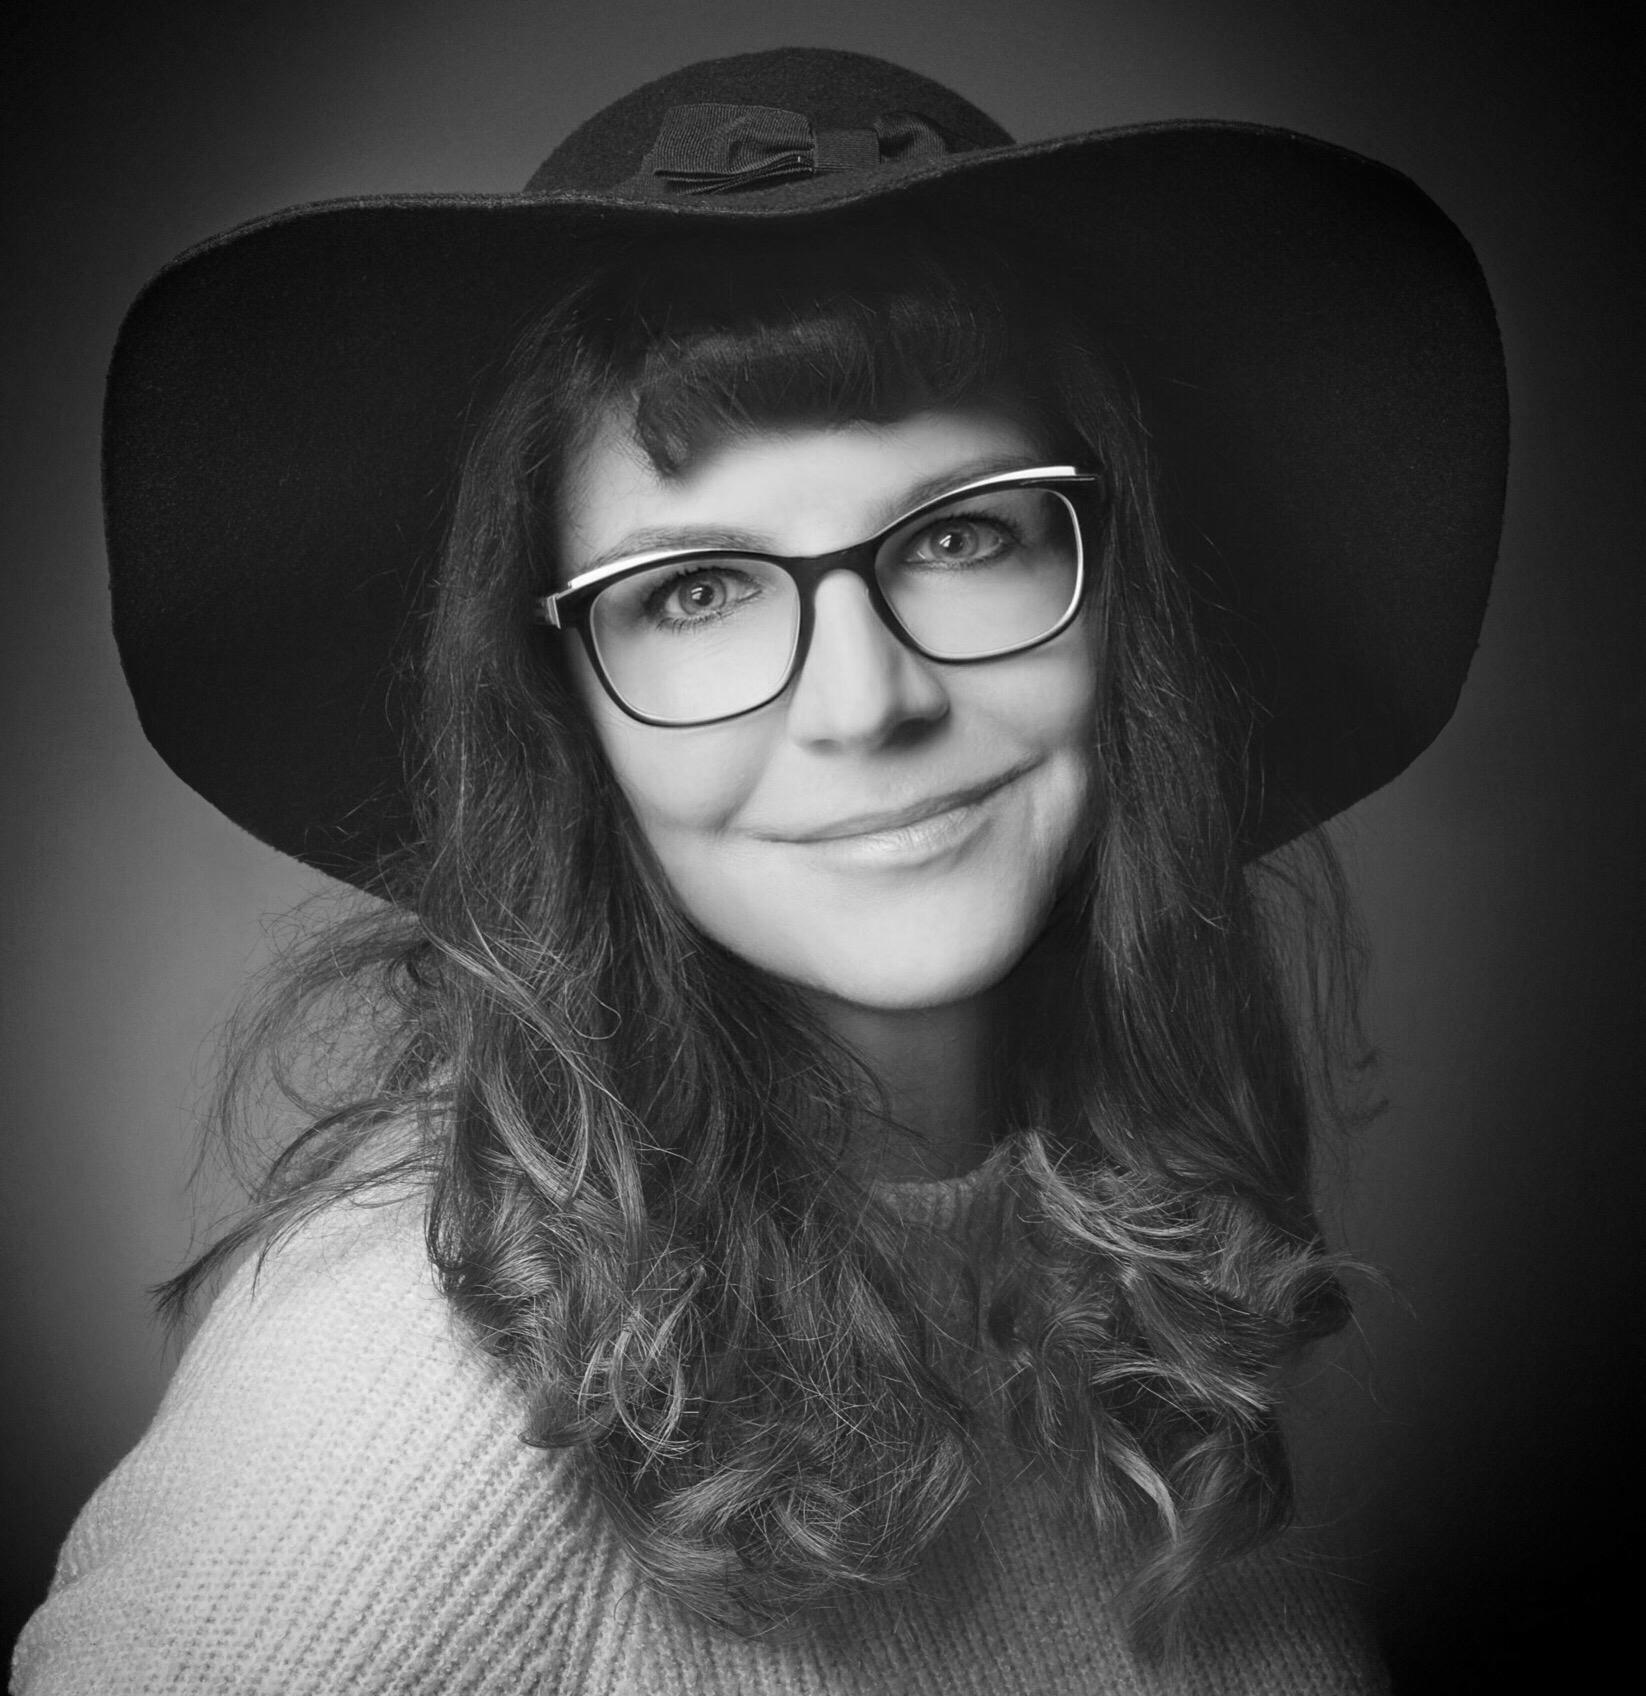 Autorin Danielle Weidig